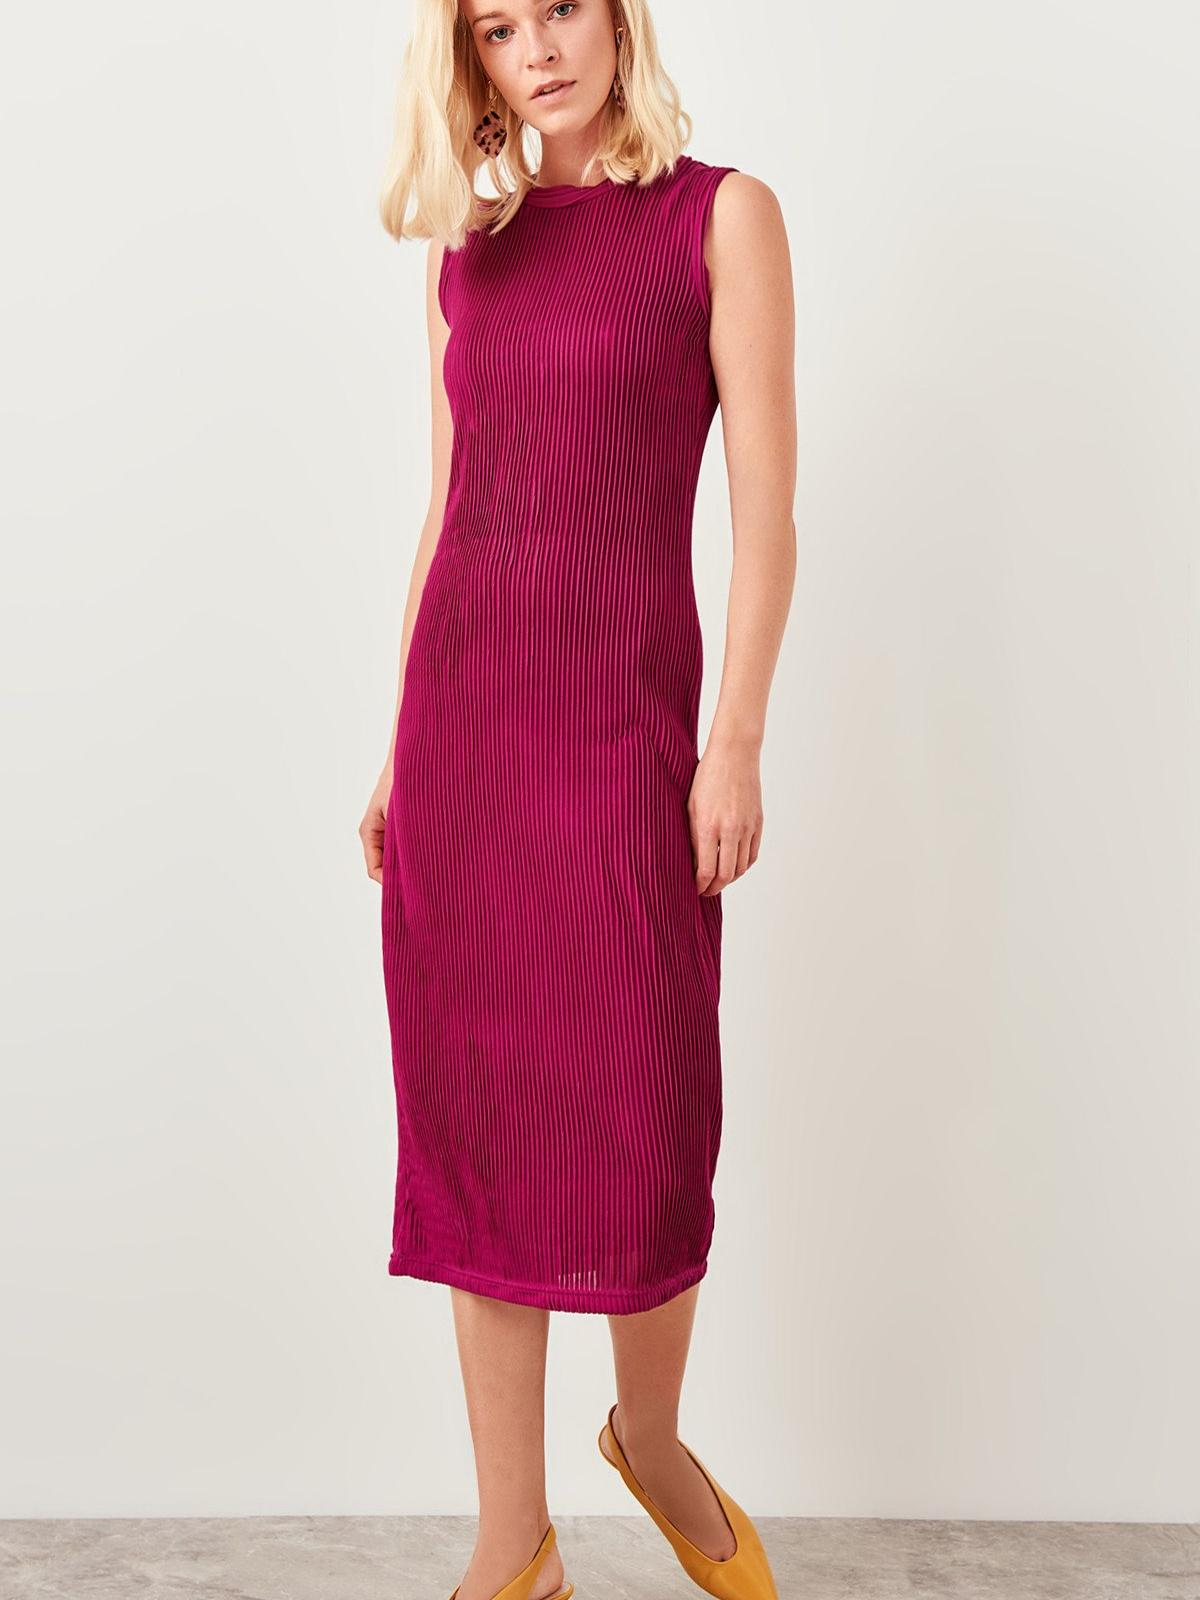 0c130d41bf best top dresses plum list and get free shipping - da49fjkb